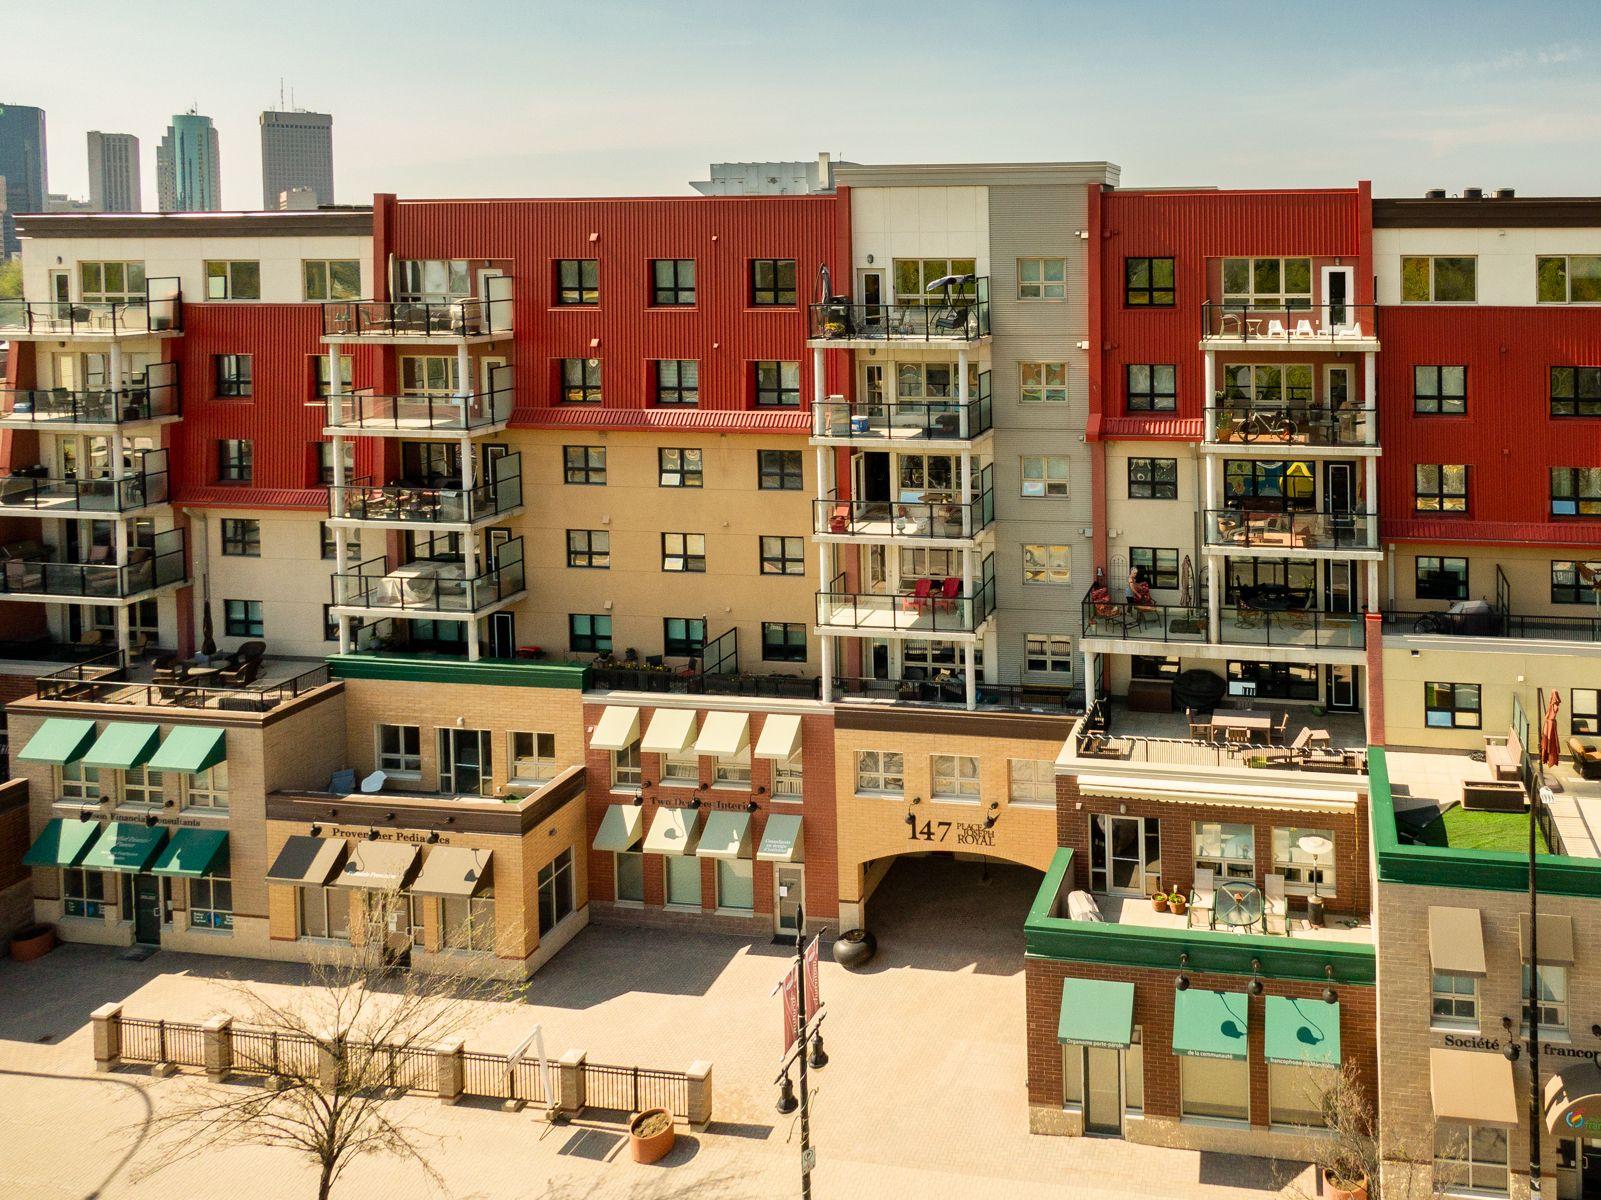 Main Photo: 608 147 Provencher Boulevard in Winnipeg: St Boniface House for sale (2A)  : MLS®# 202010953